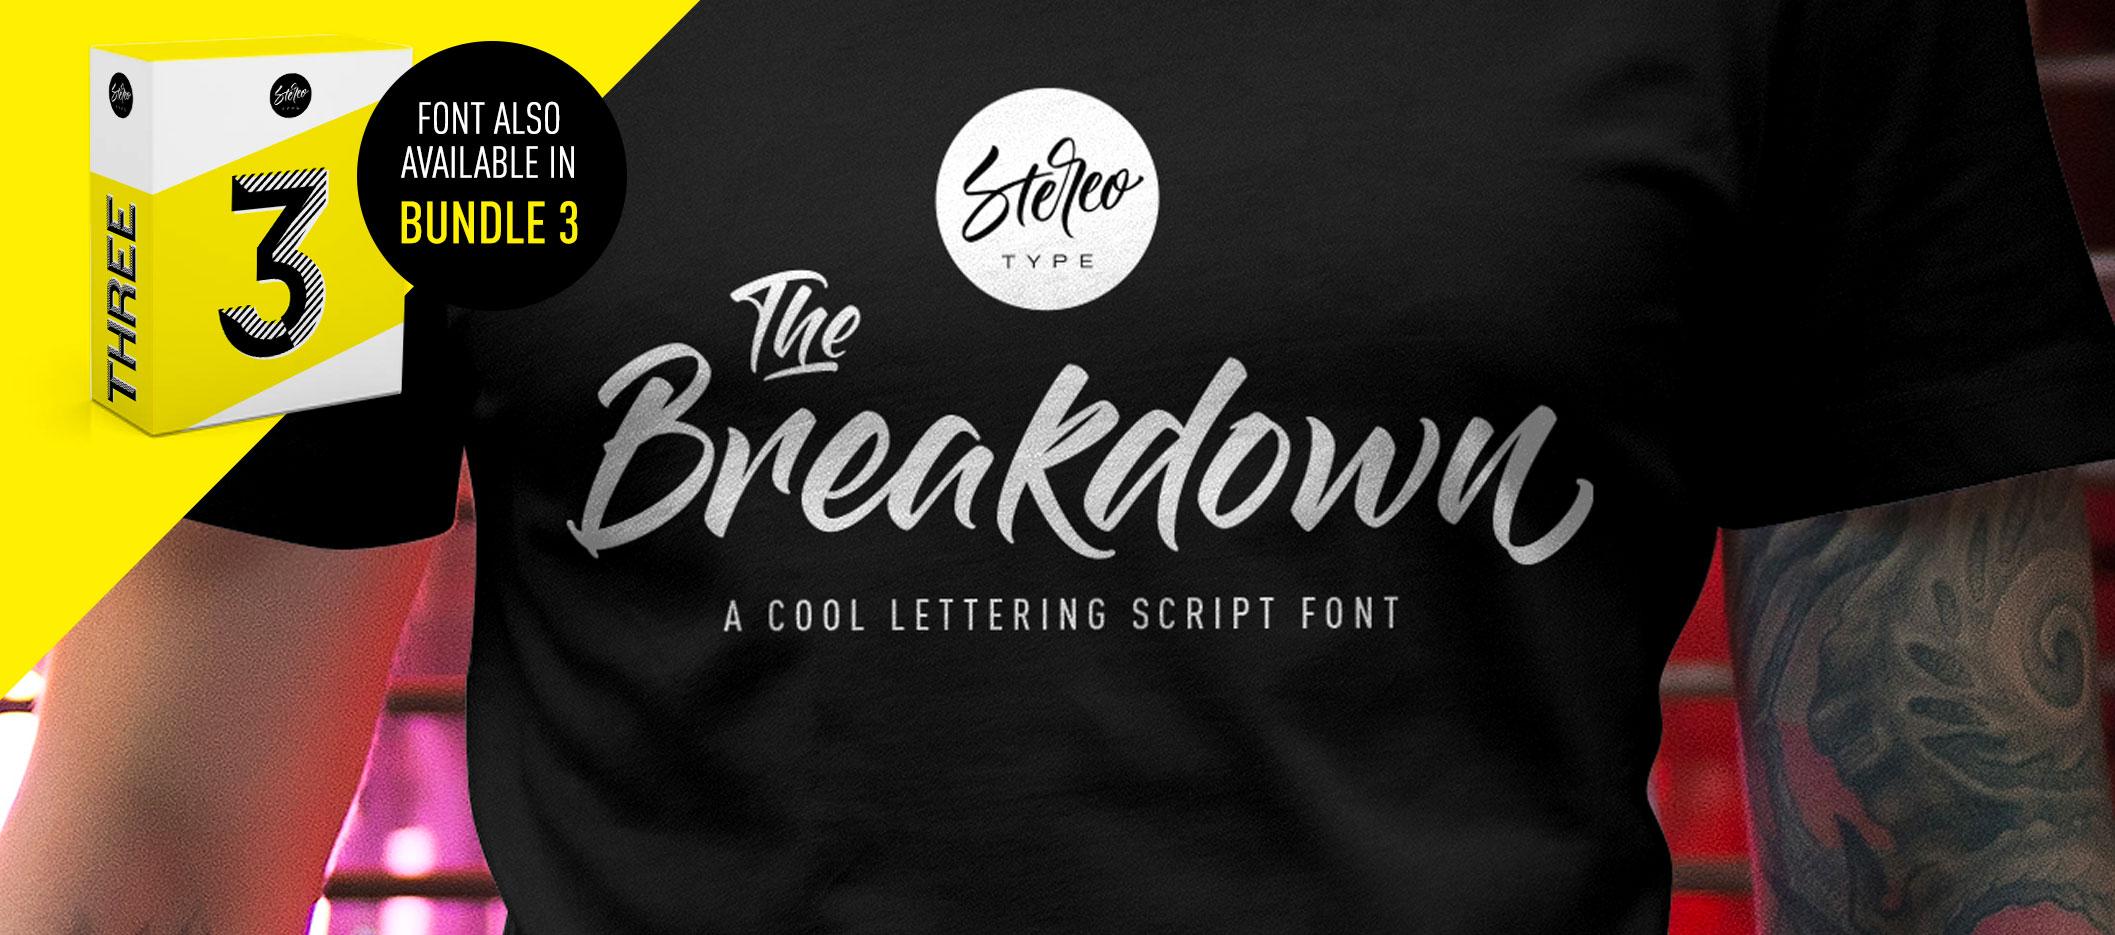 the_breakdown_bundle